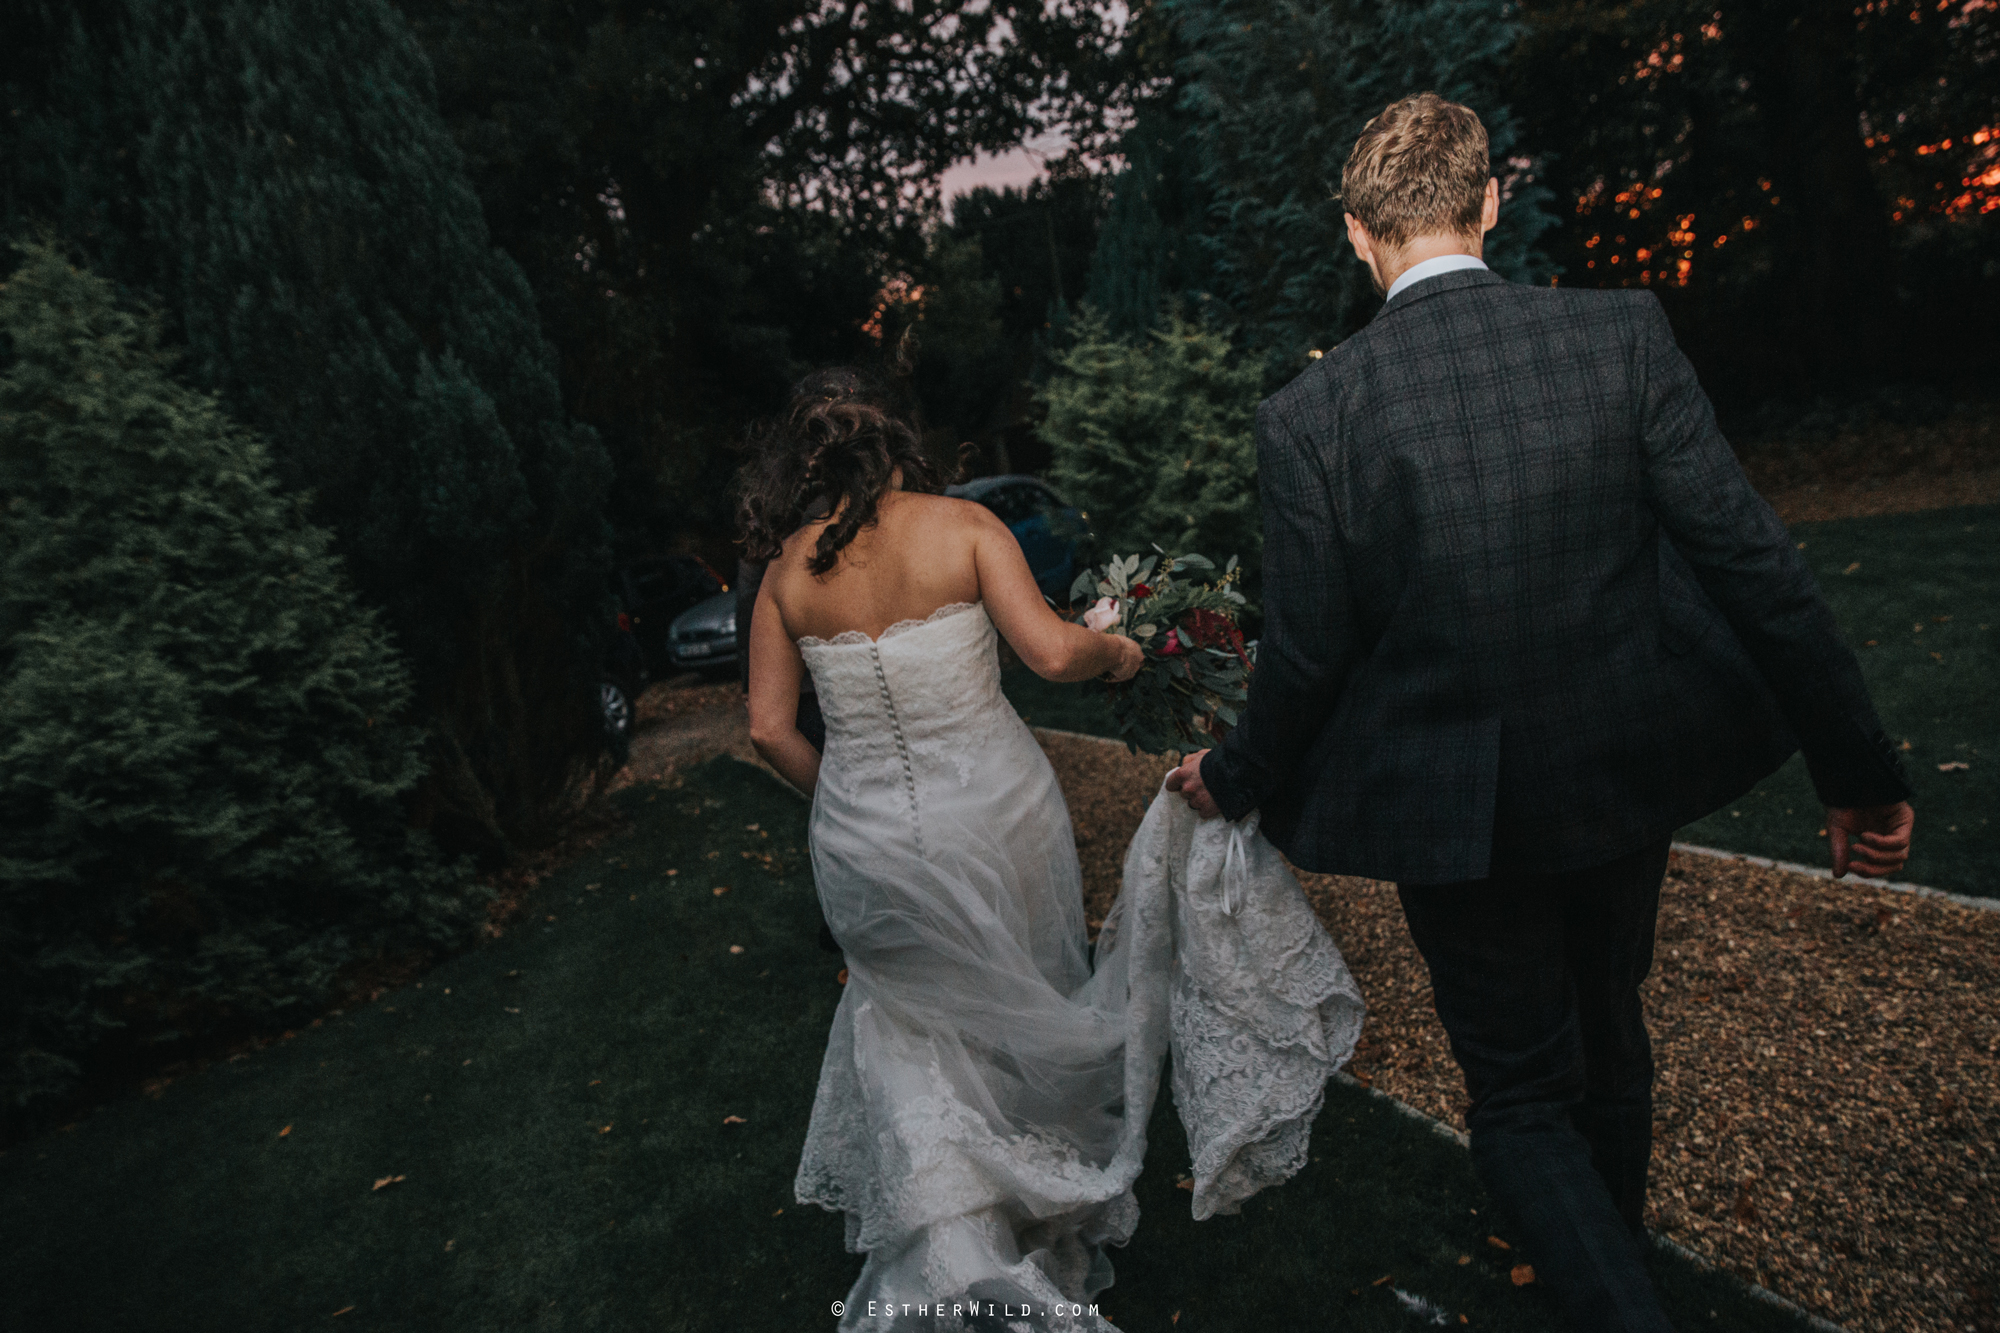 Reading_Room_Weddings_Alby_Norwich_Photographer_Esther_Wild_IMG_2664.jpg